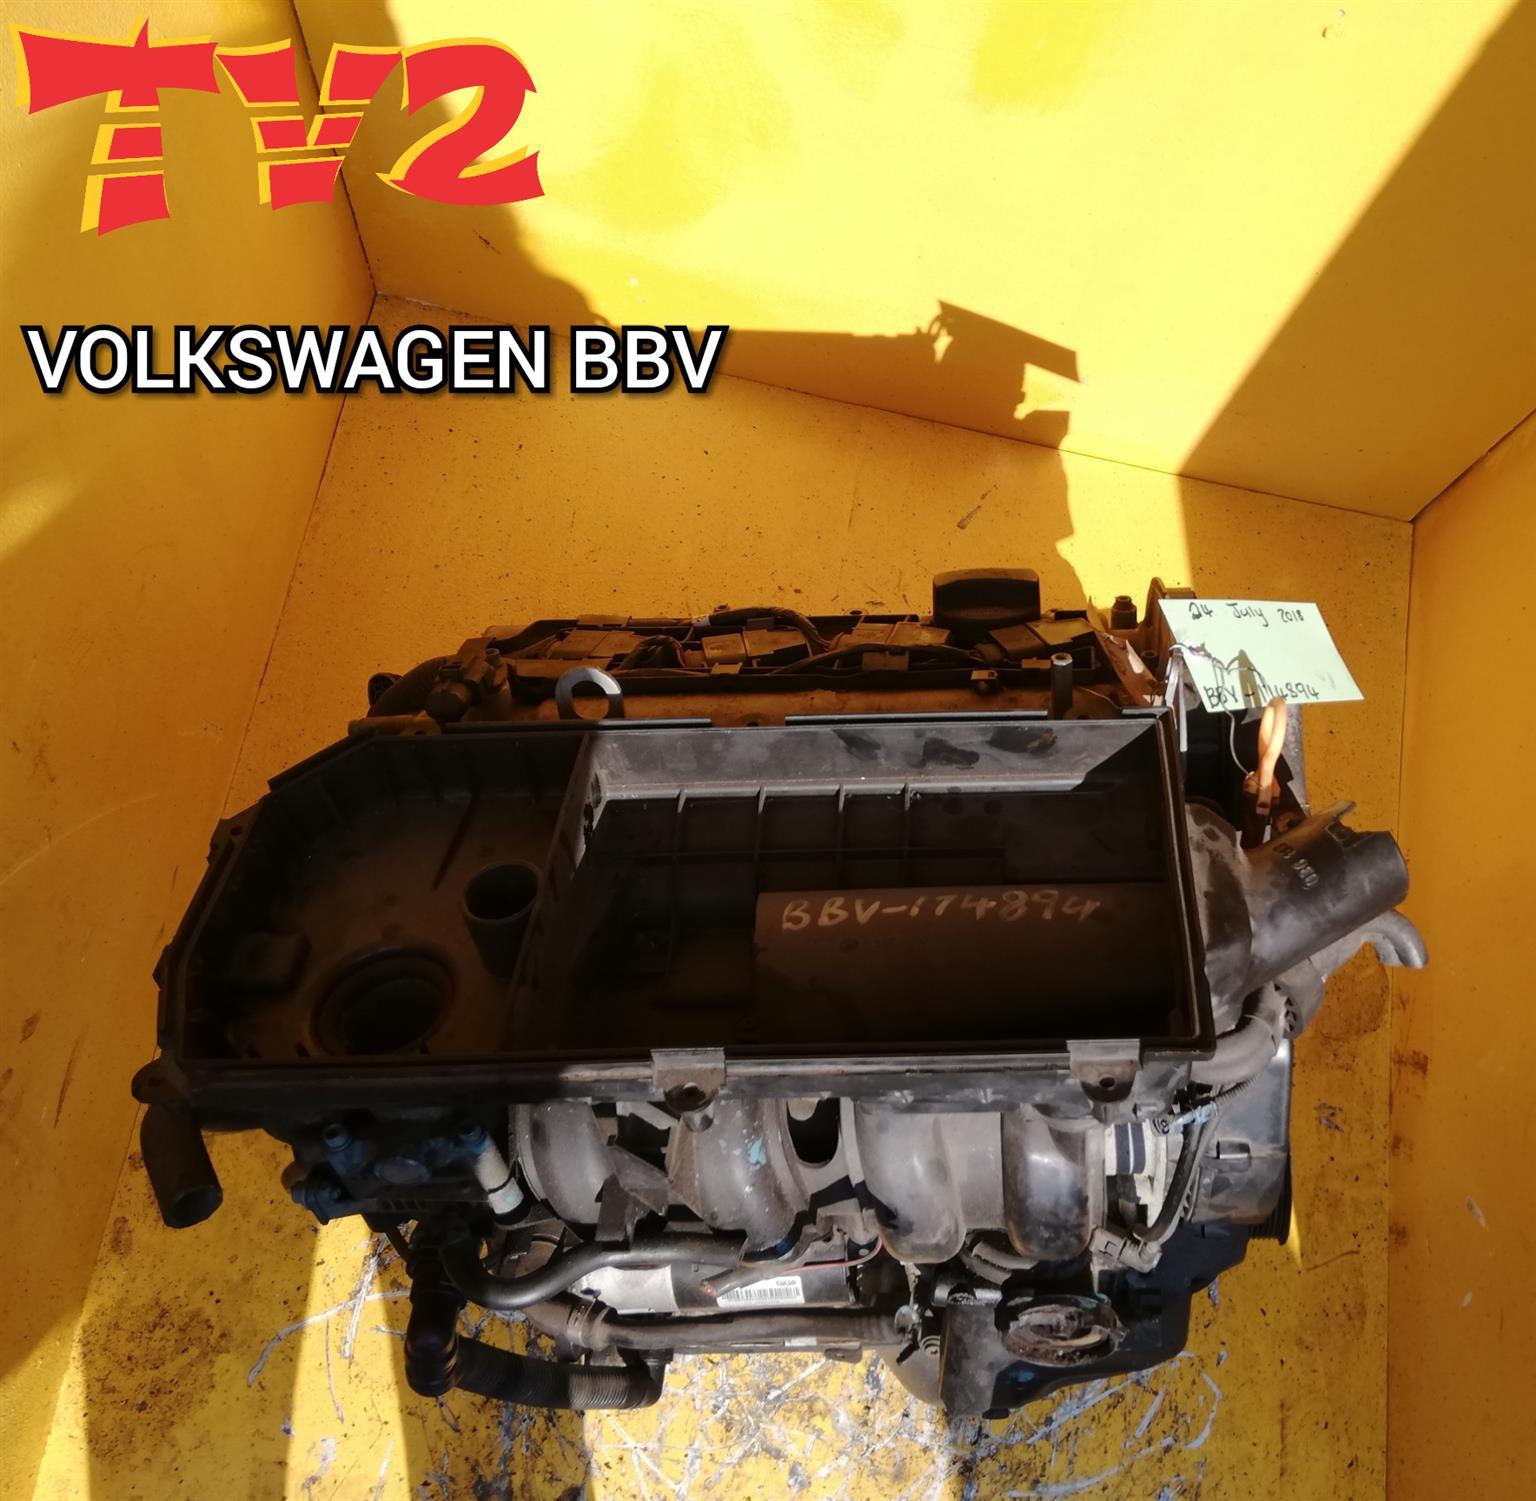 VOLKSWAGEN- BBY (ENGINE FOR SALE)